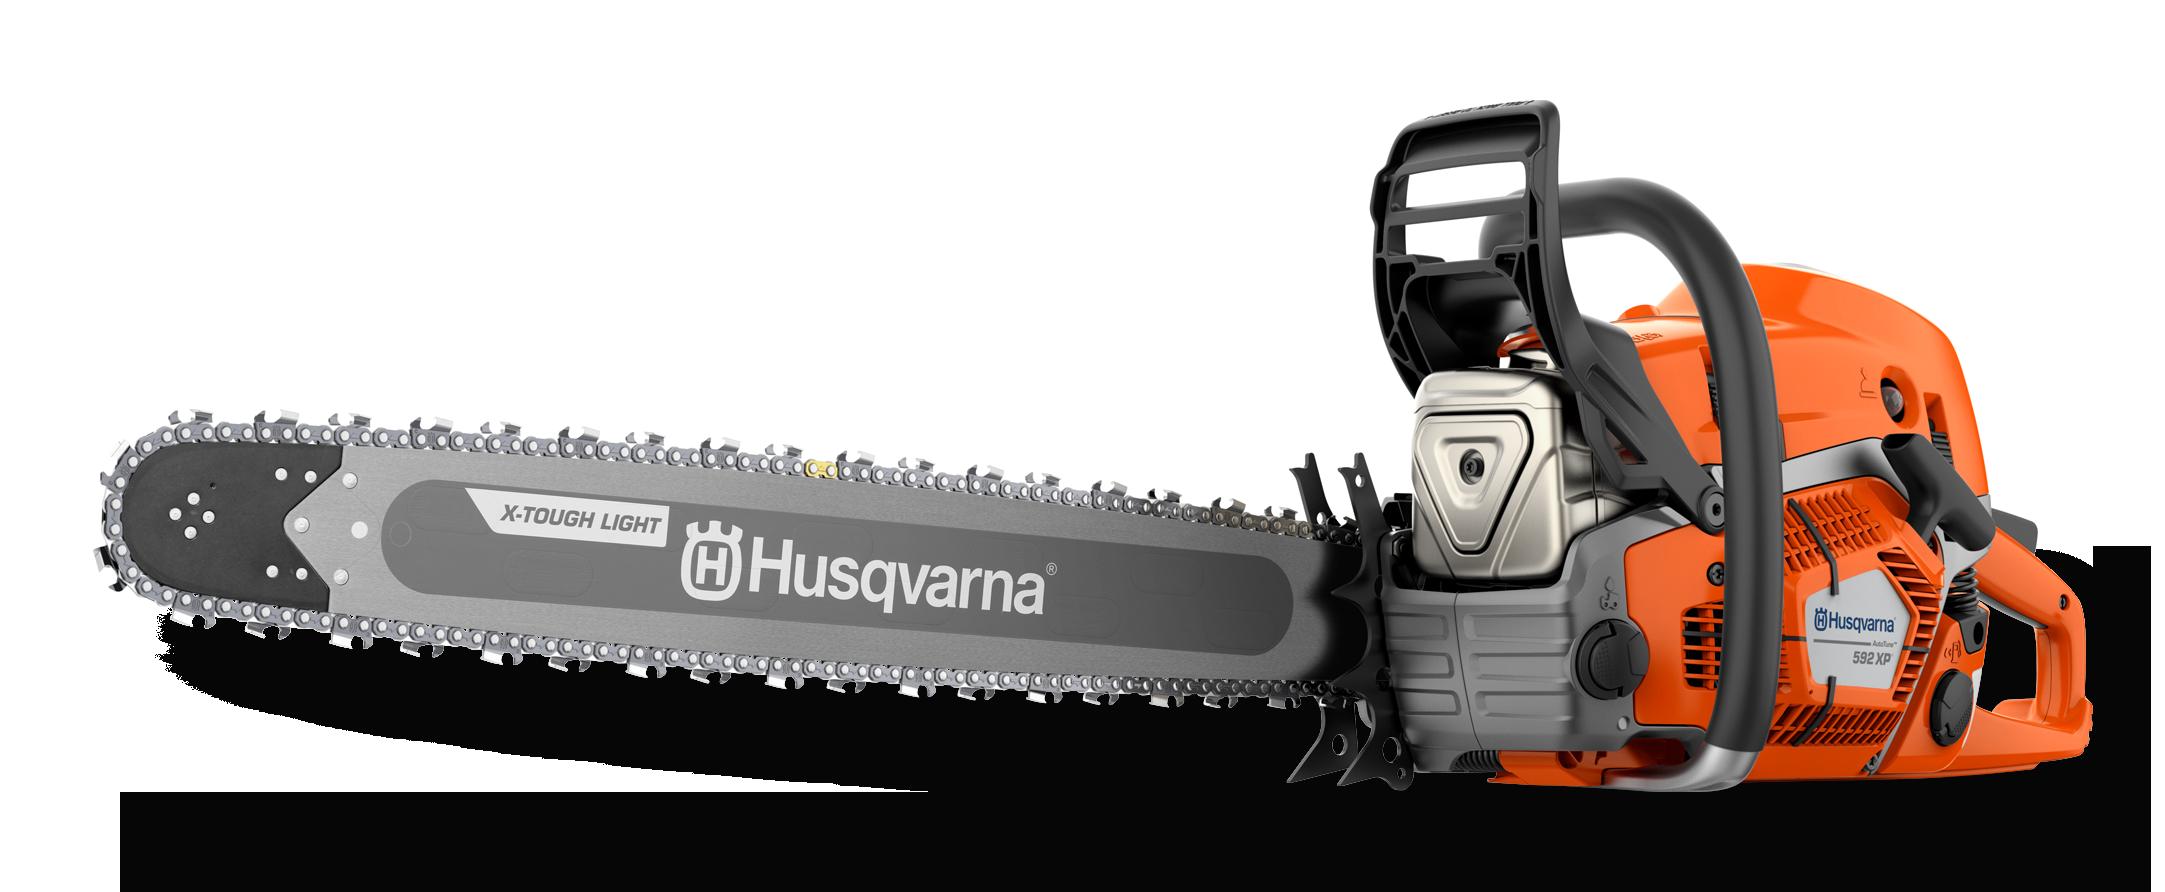 Die neue Husqvarna 592 XP